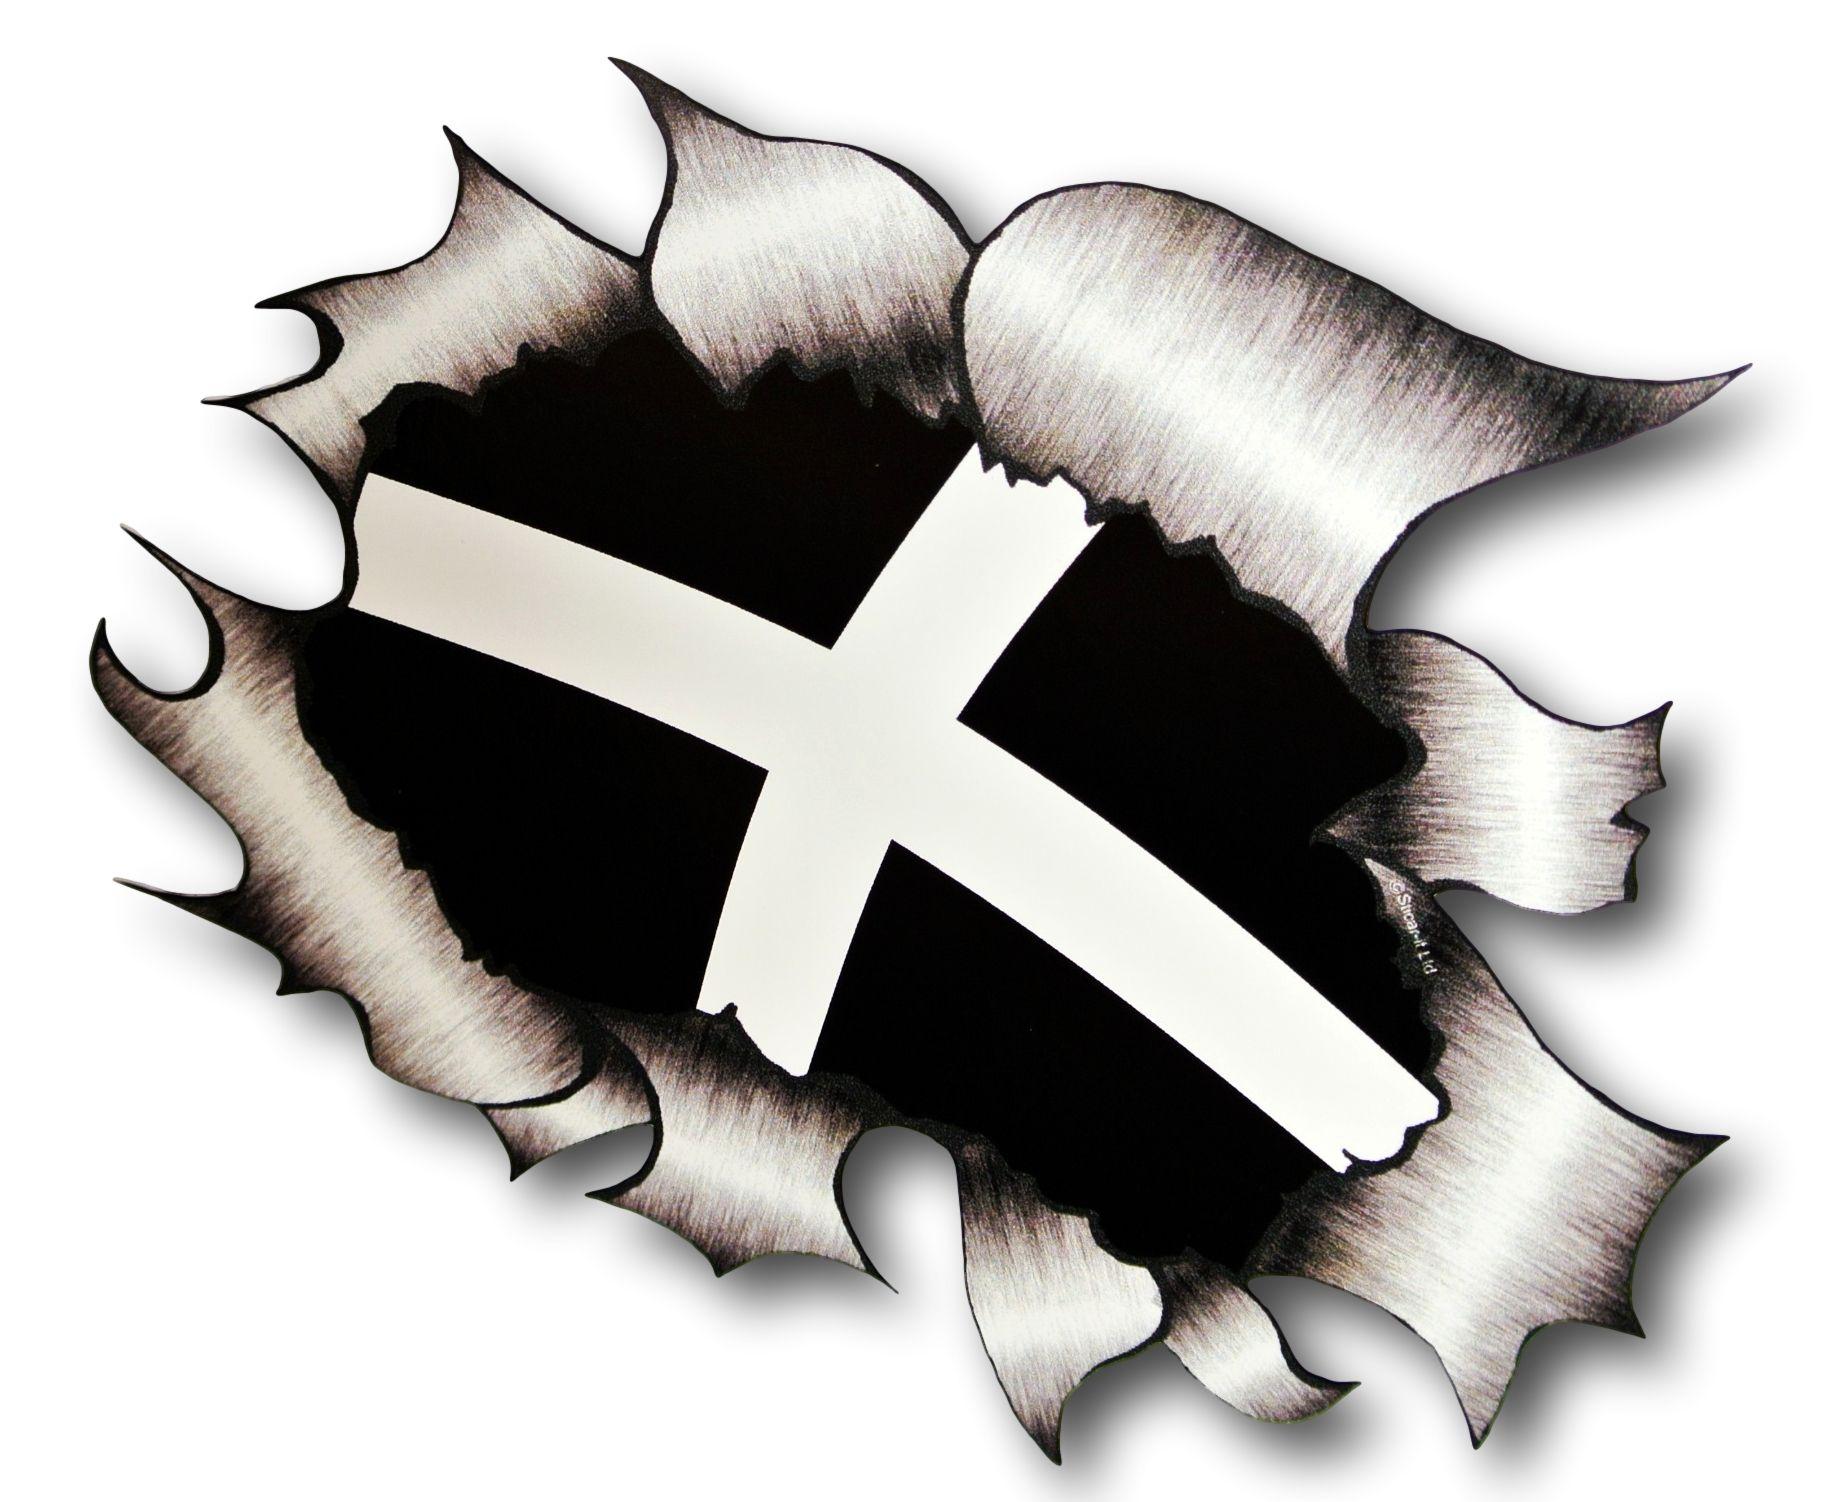 Ripped Torn Metal Design With Cornwall Cornish Flag Motif